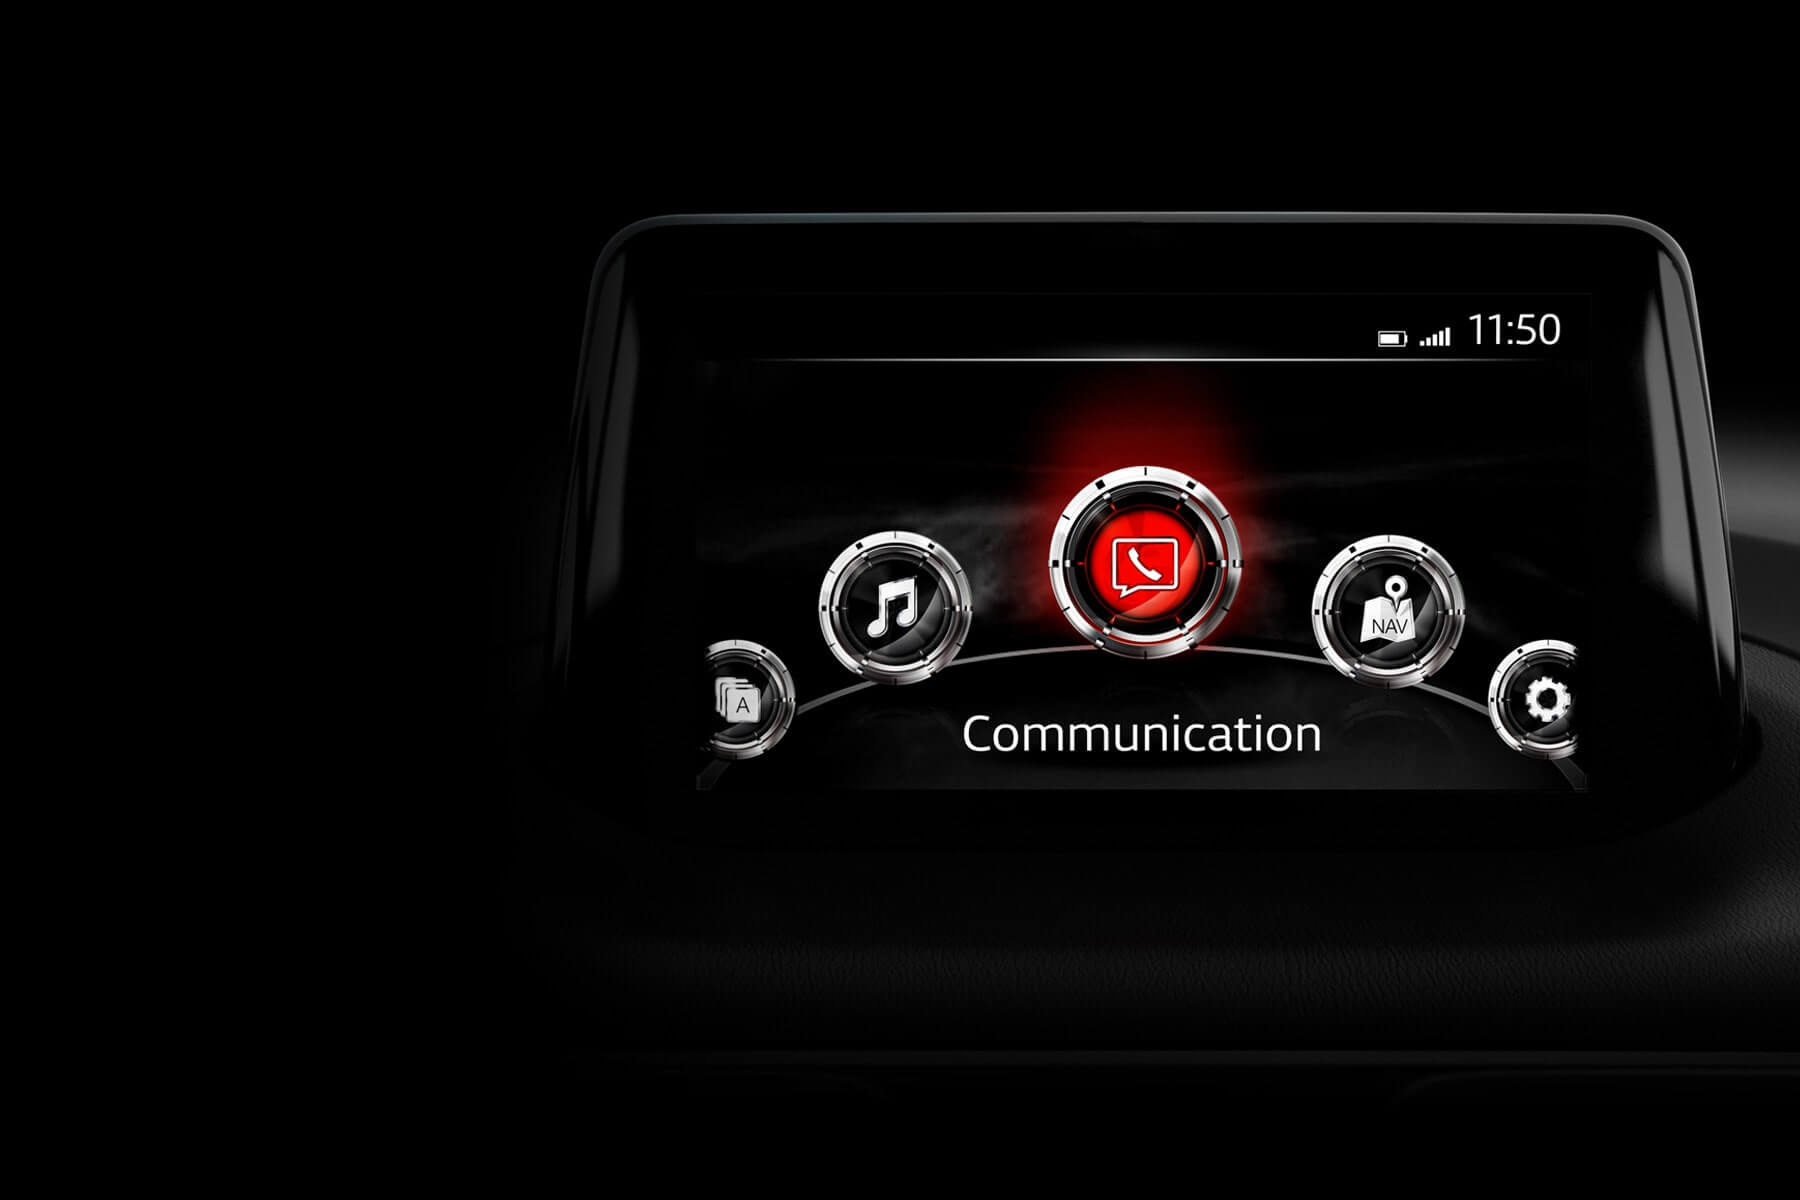 2018-mazda-3-hatchback-mazda-connect-system